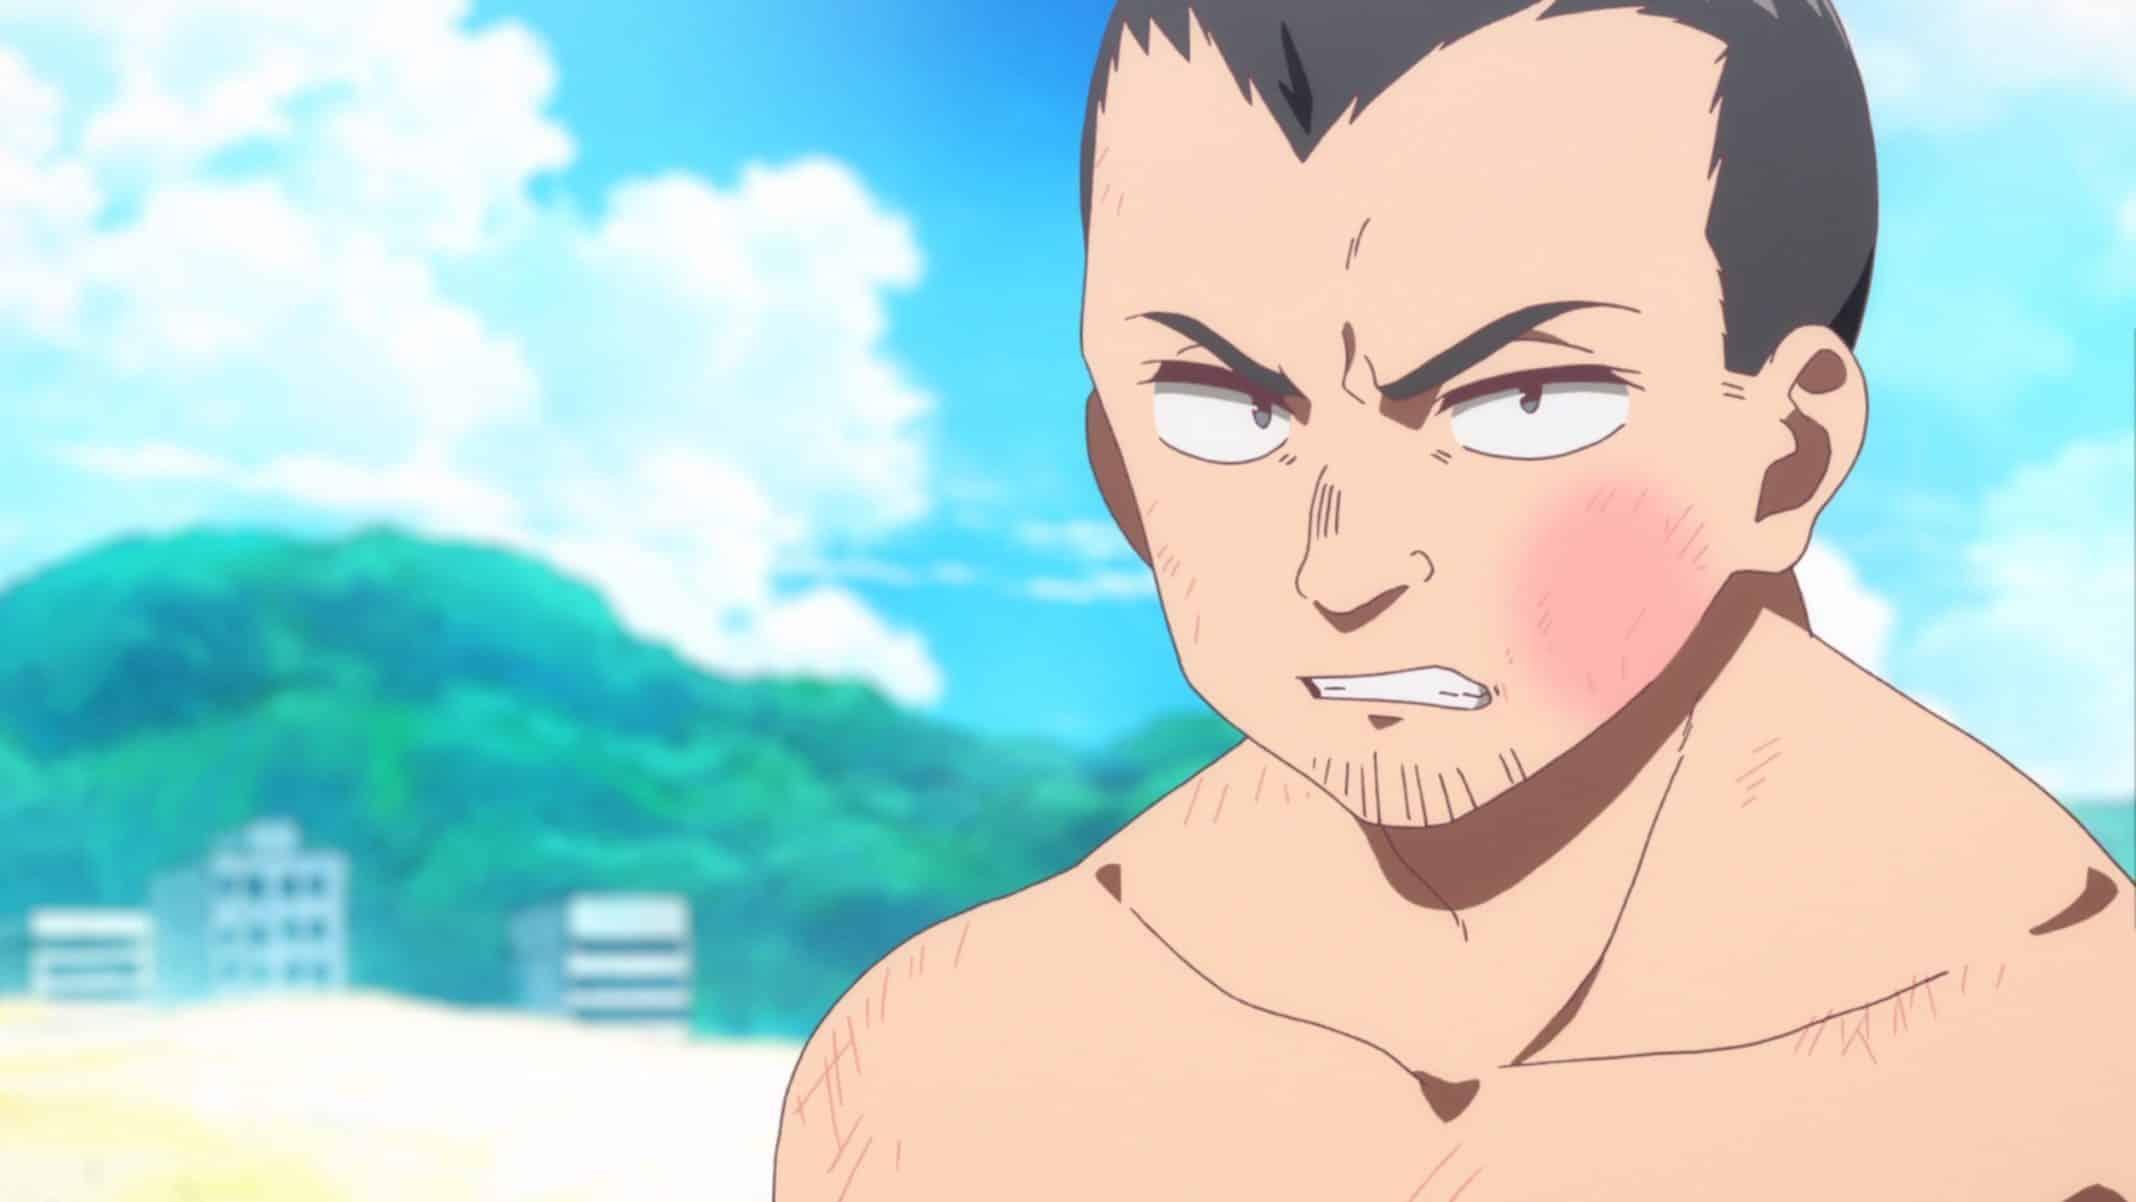 Kibe (Akasaka Masayuki) after fighting with Kazuya.